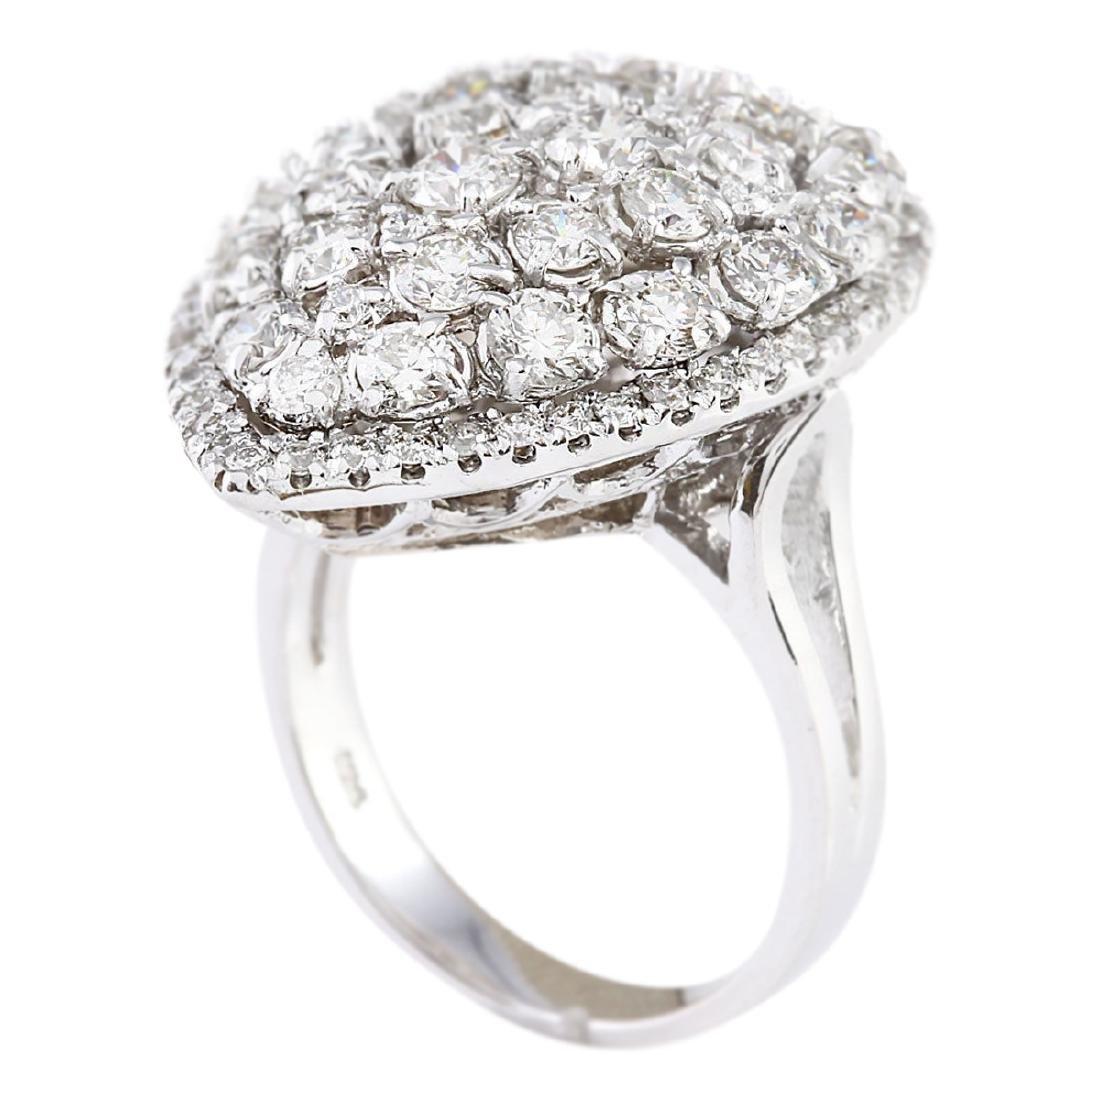 3.70 CTW Natural Diamond Ring In 18K White Gold - 3